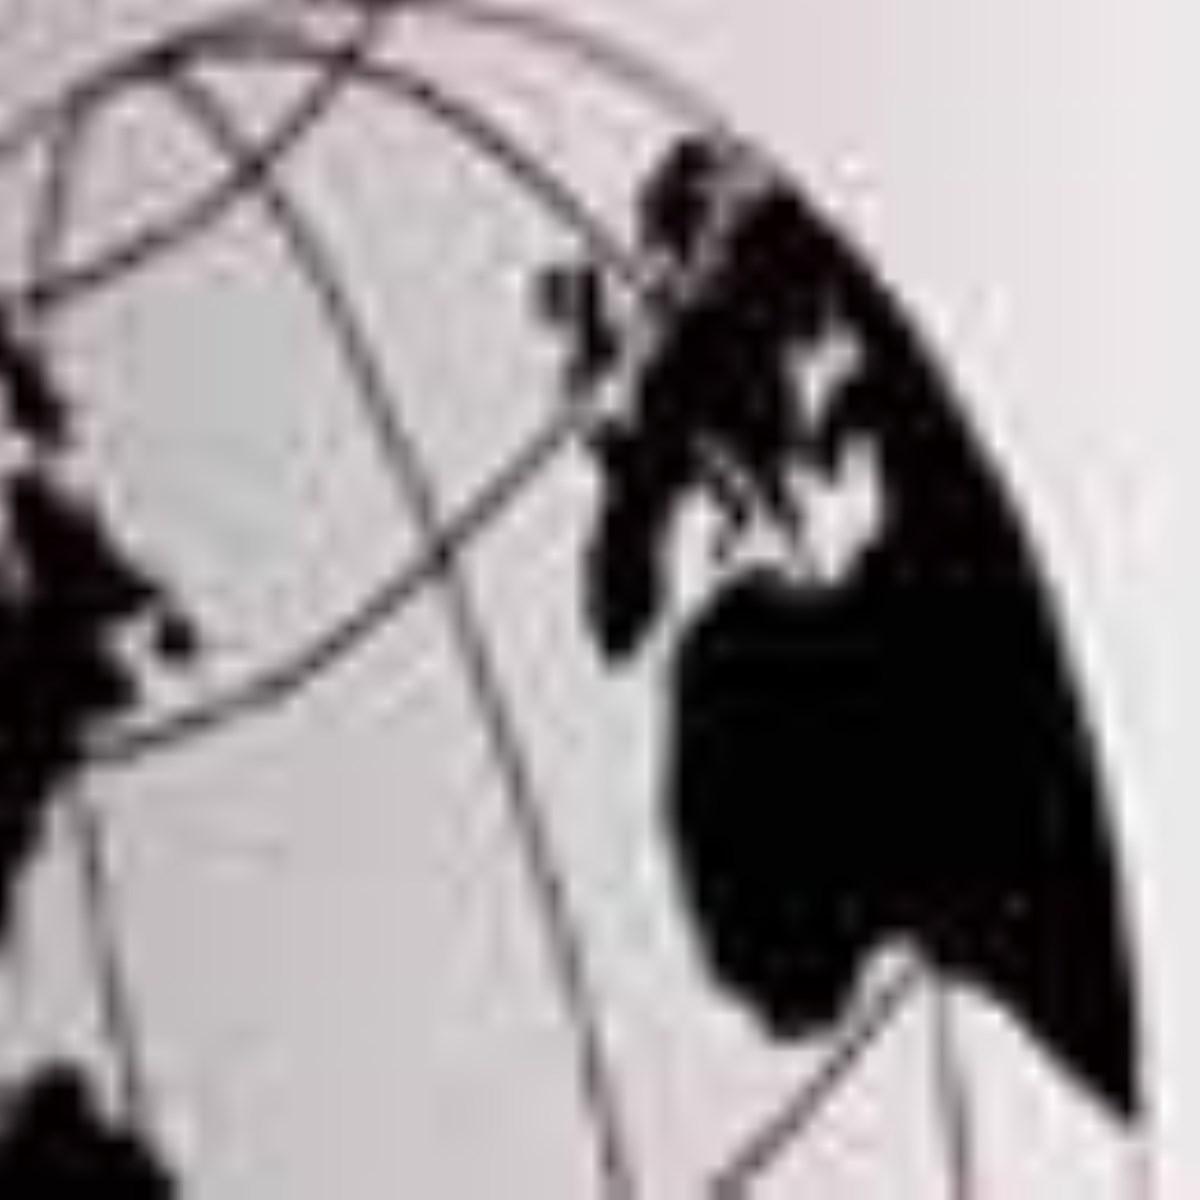 نظريه عصر جهاني و پايان مدرنيته( بررسي نظريات مارتين آلبرو)